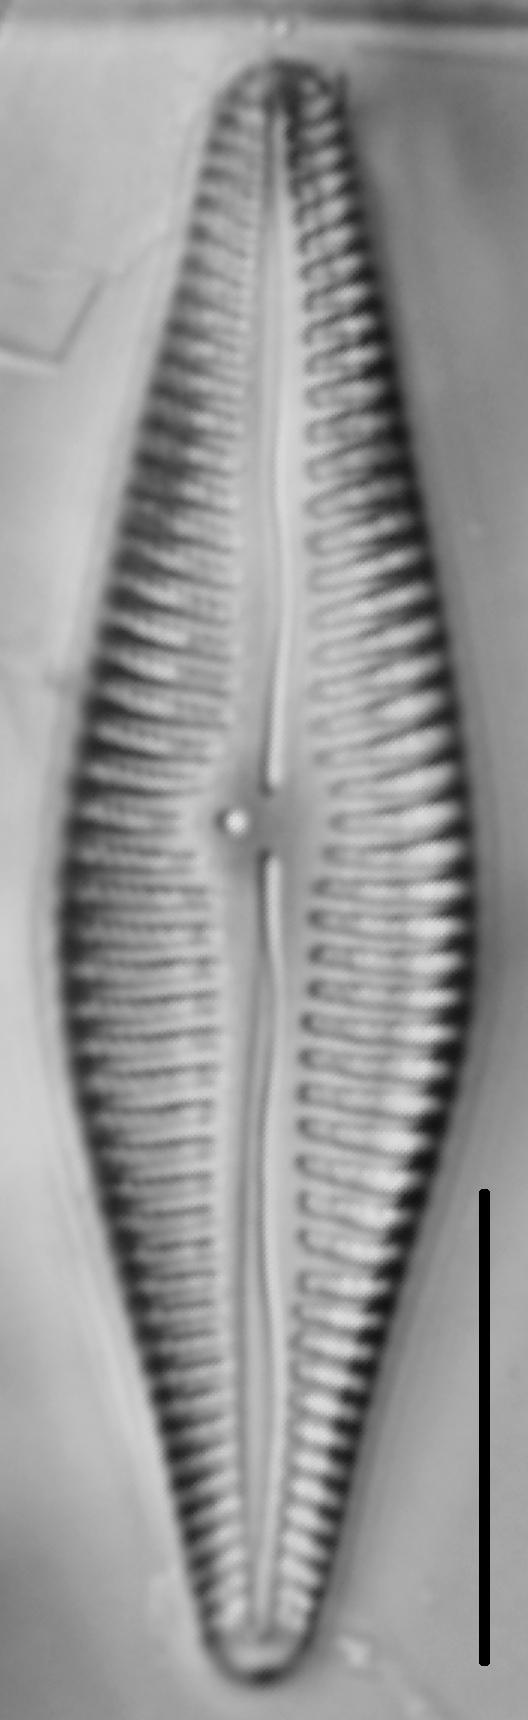 Gomphoneis eriense var. angularis LM2